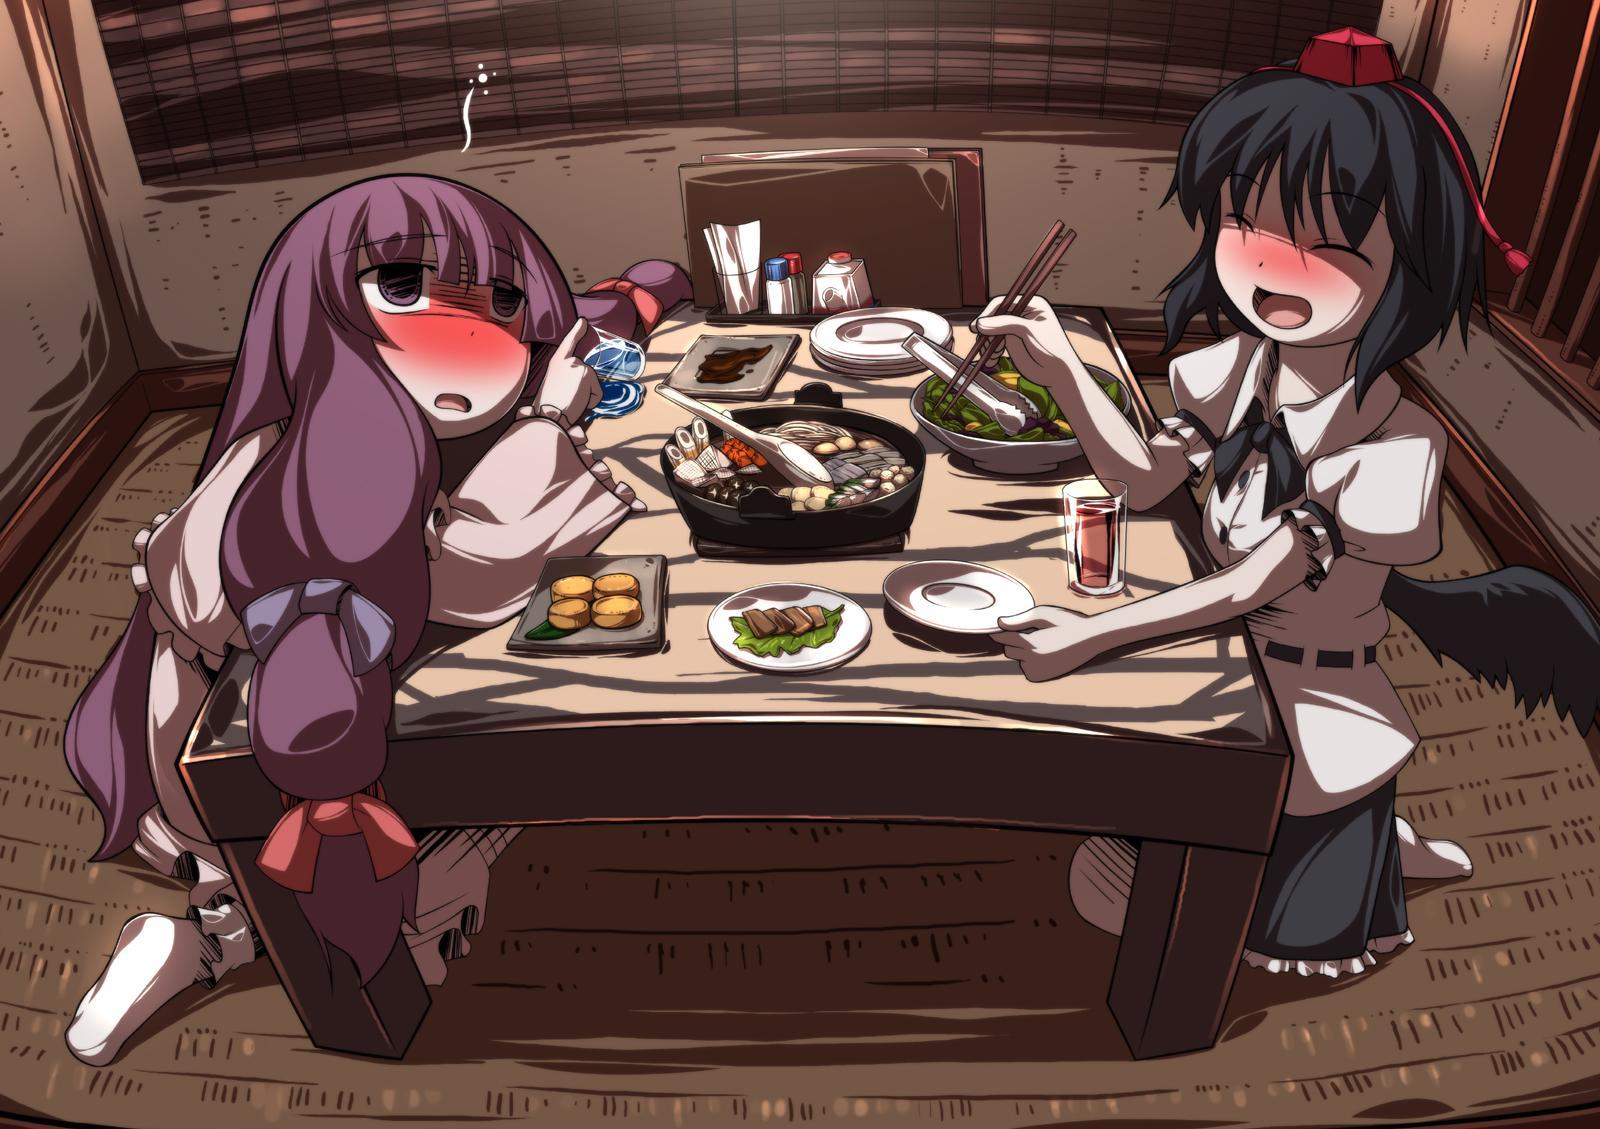 2girls drink food kotatsu patchouli_knowledge shameimaru_aya touhou